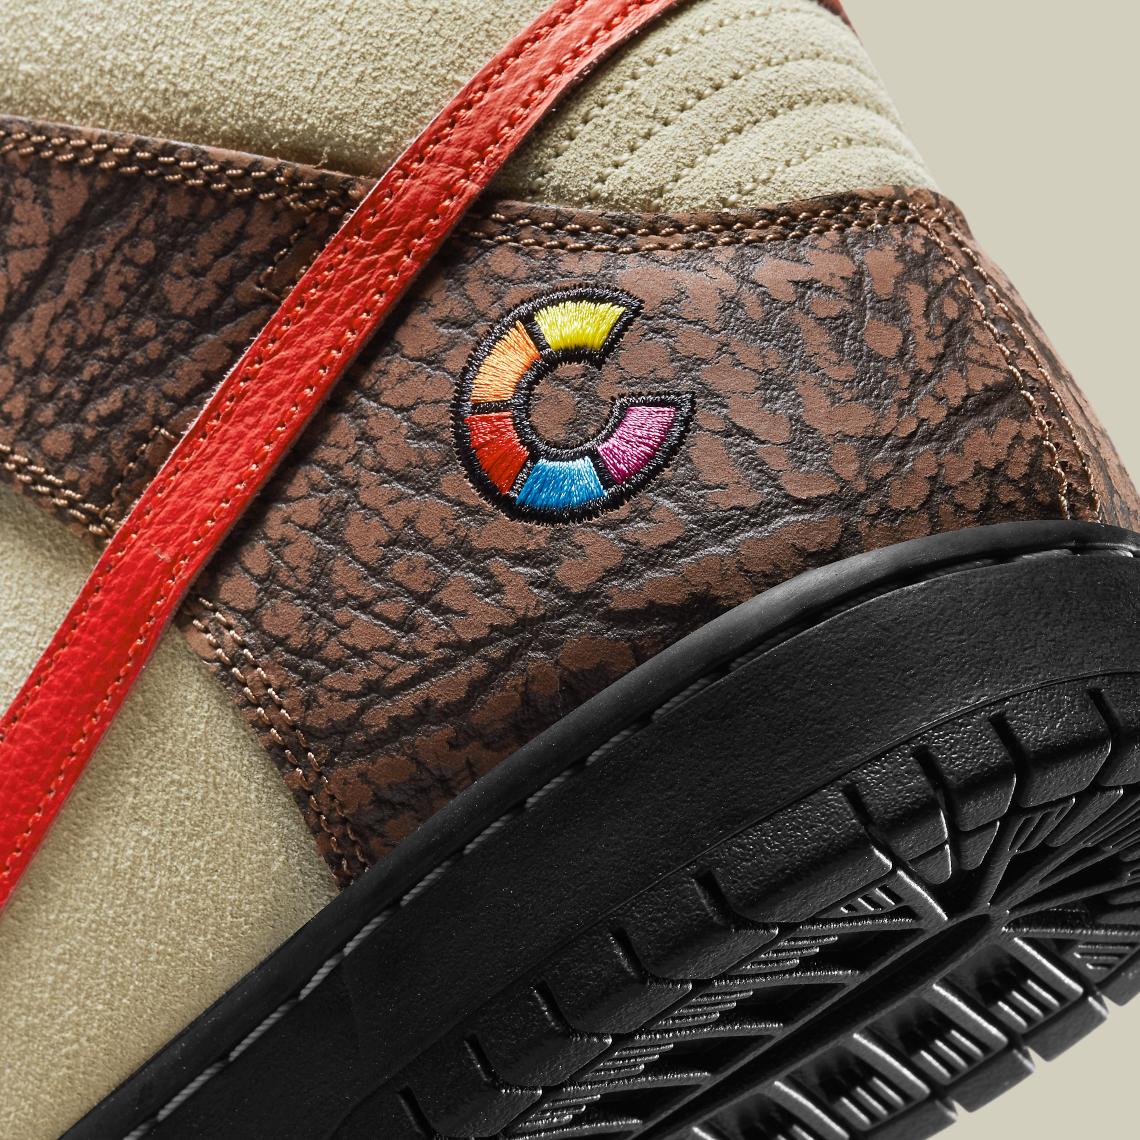 Nike-SB-Dunk-High-CZ2205-700-Color-Skates-CZ2205-700-1.jpg?w=1140